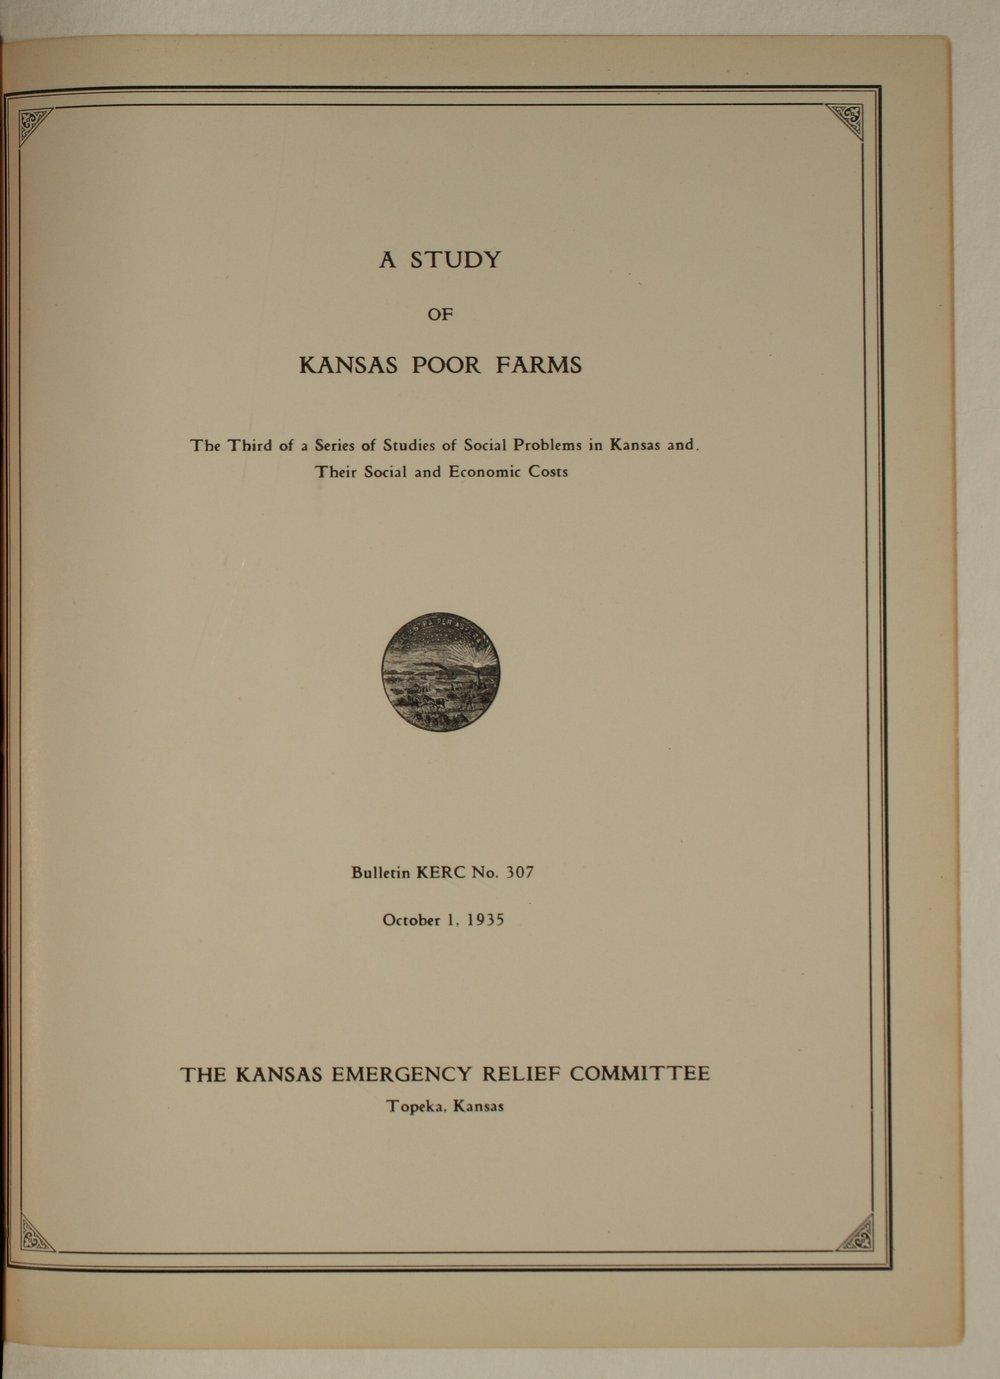 Kansas Emergency Relief Committee, bulletin 307 - i